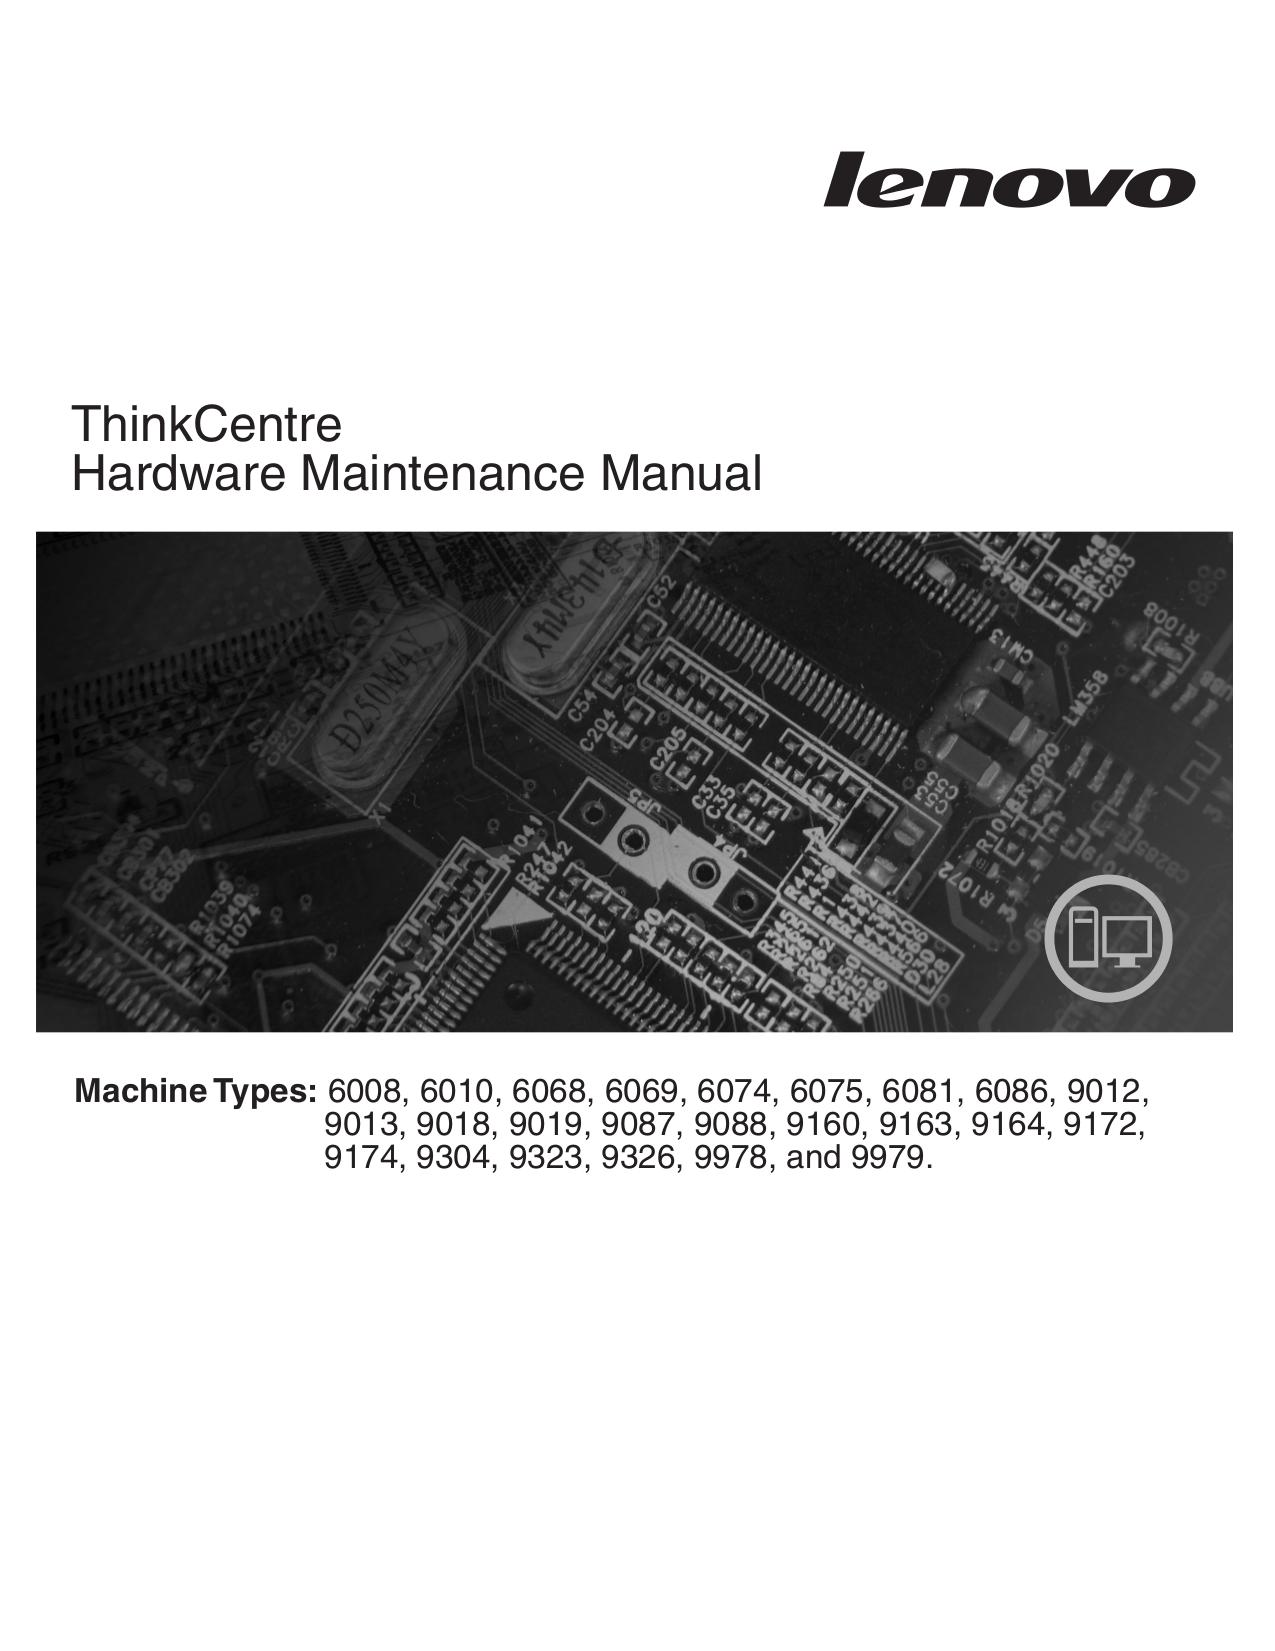 pdf for Lenovo Desktop ThinkCentre M57 9174 manual